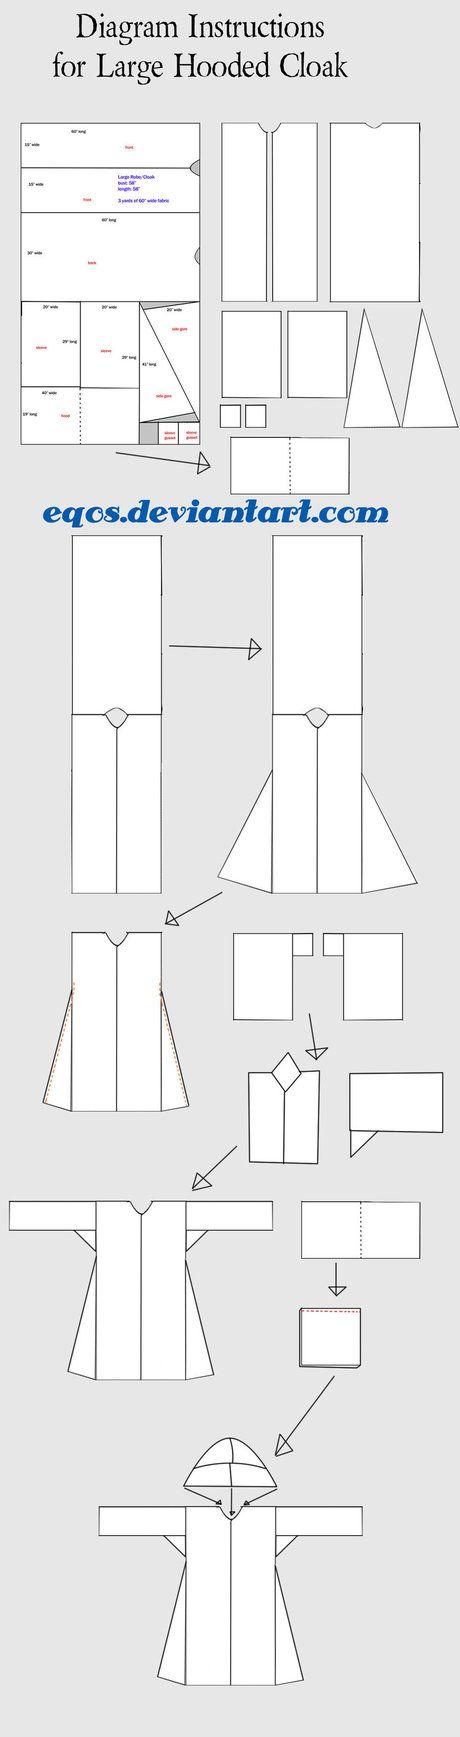 Diagram for Large Hooded Cloak by ~eqos on deviantART